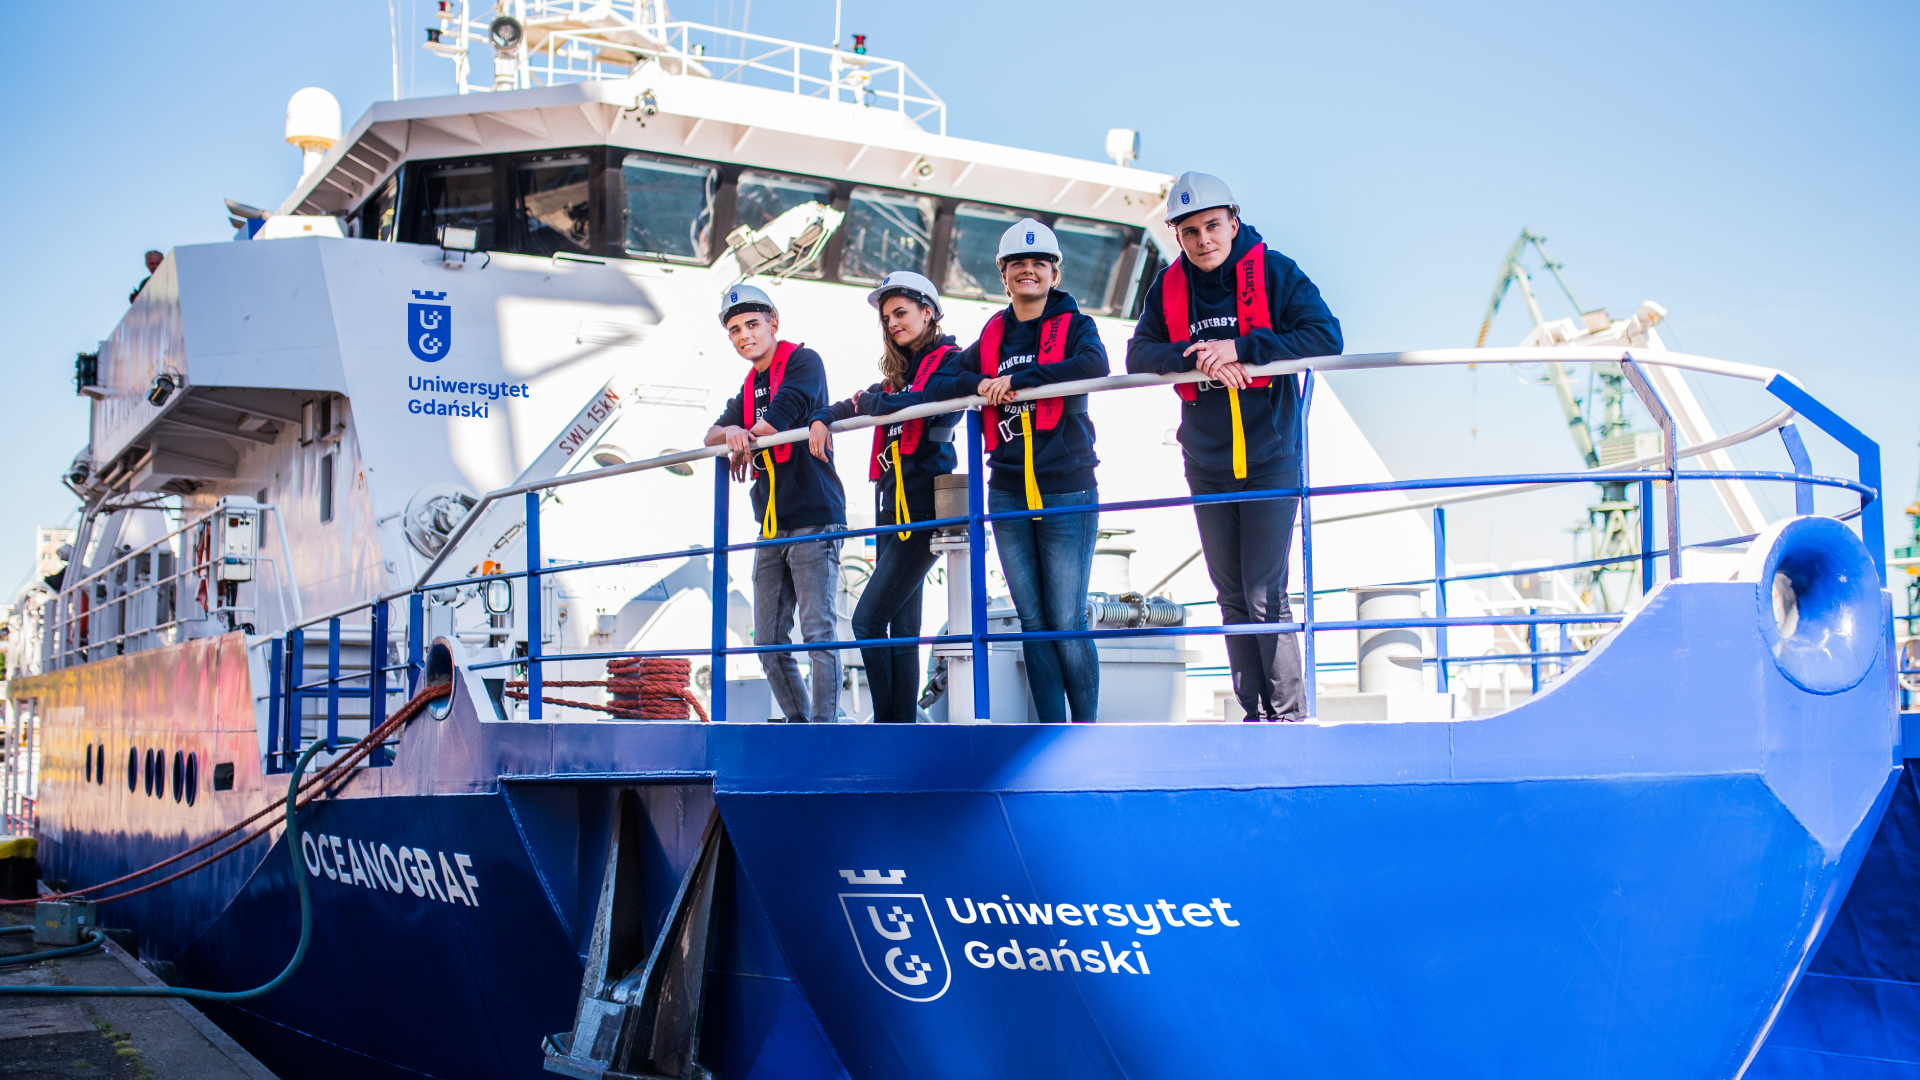 logo Uniwersytet Gdański projekt Oceanograf